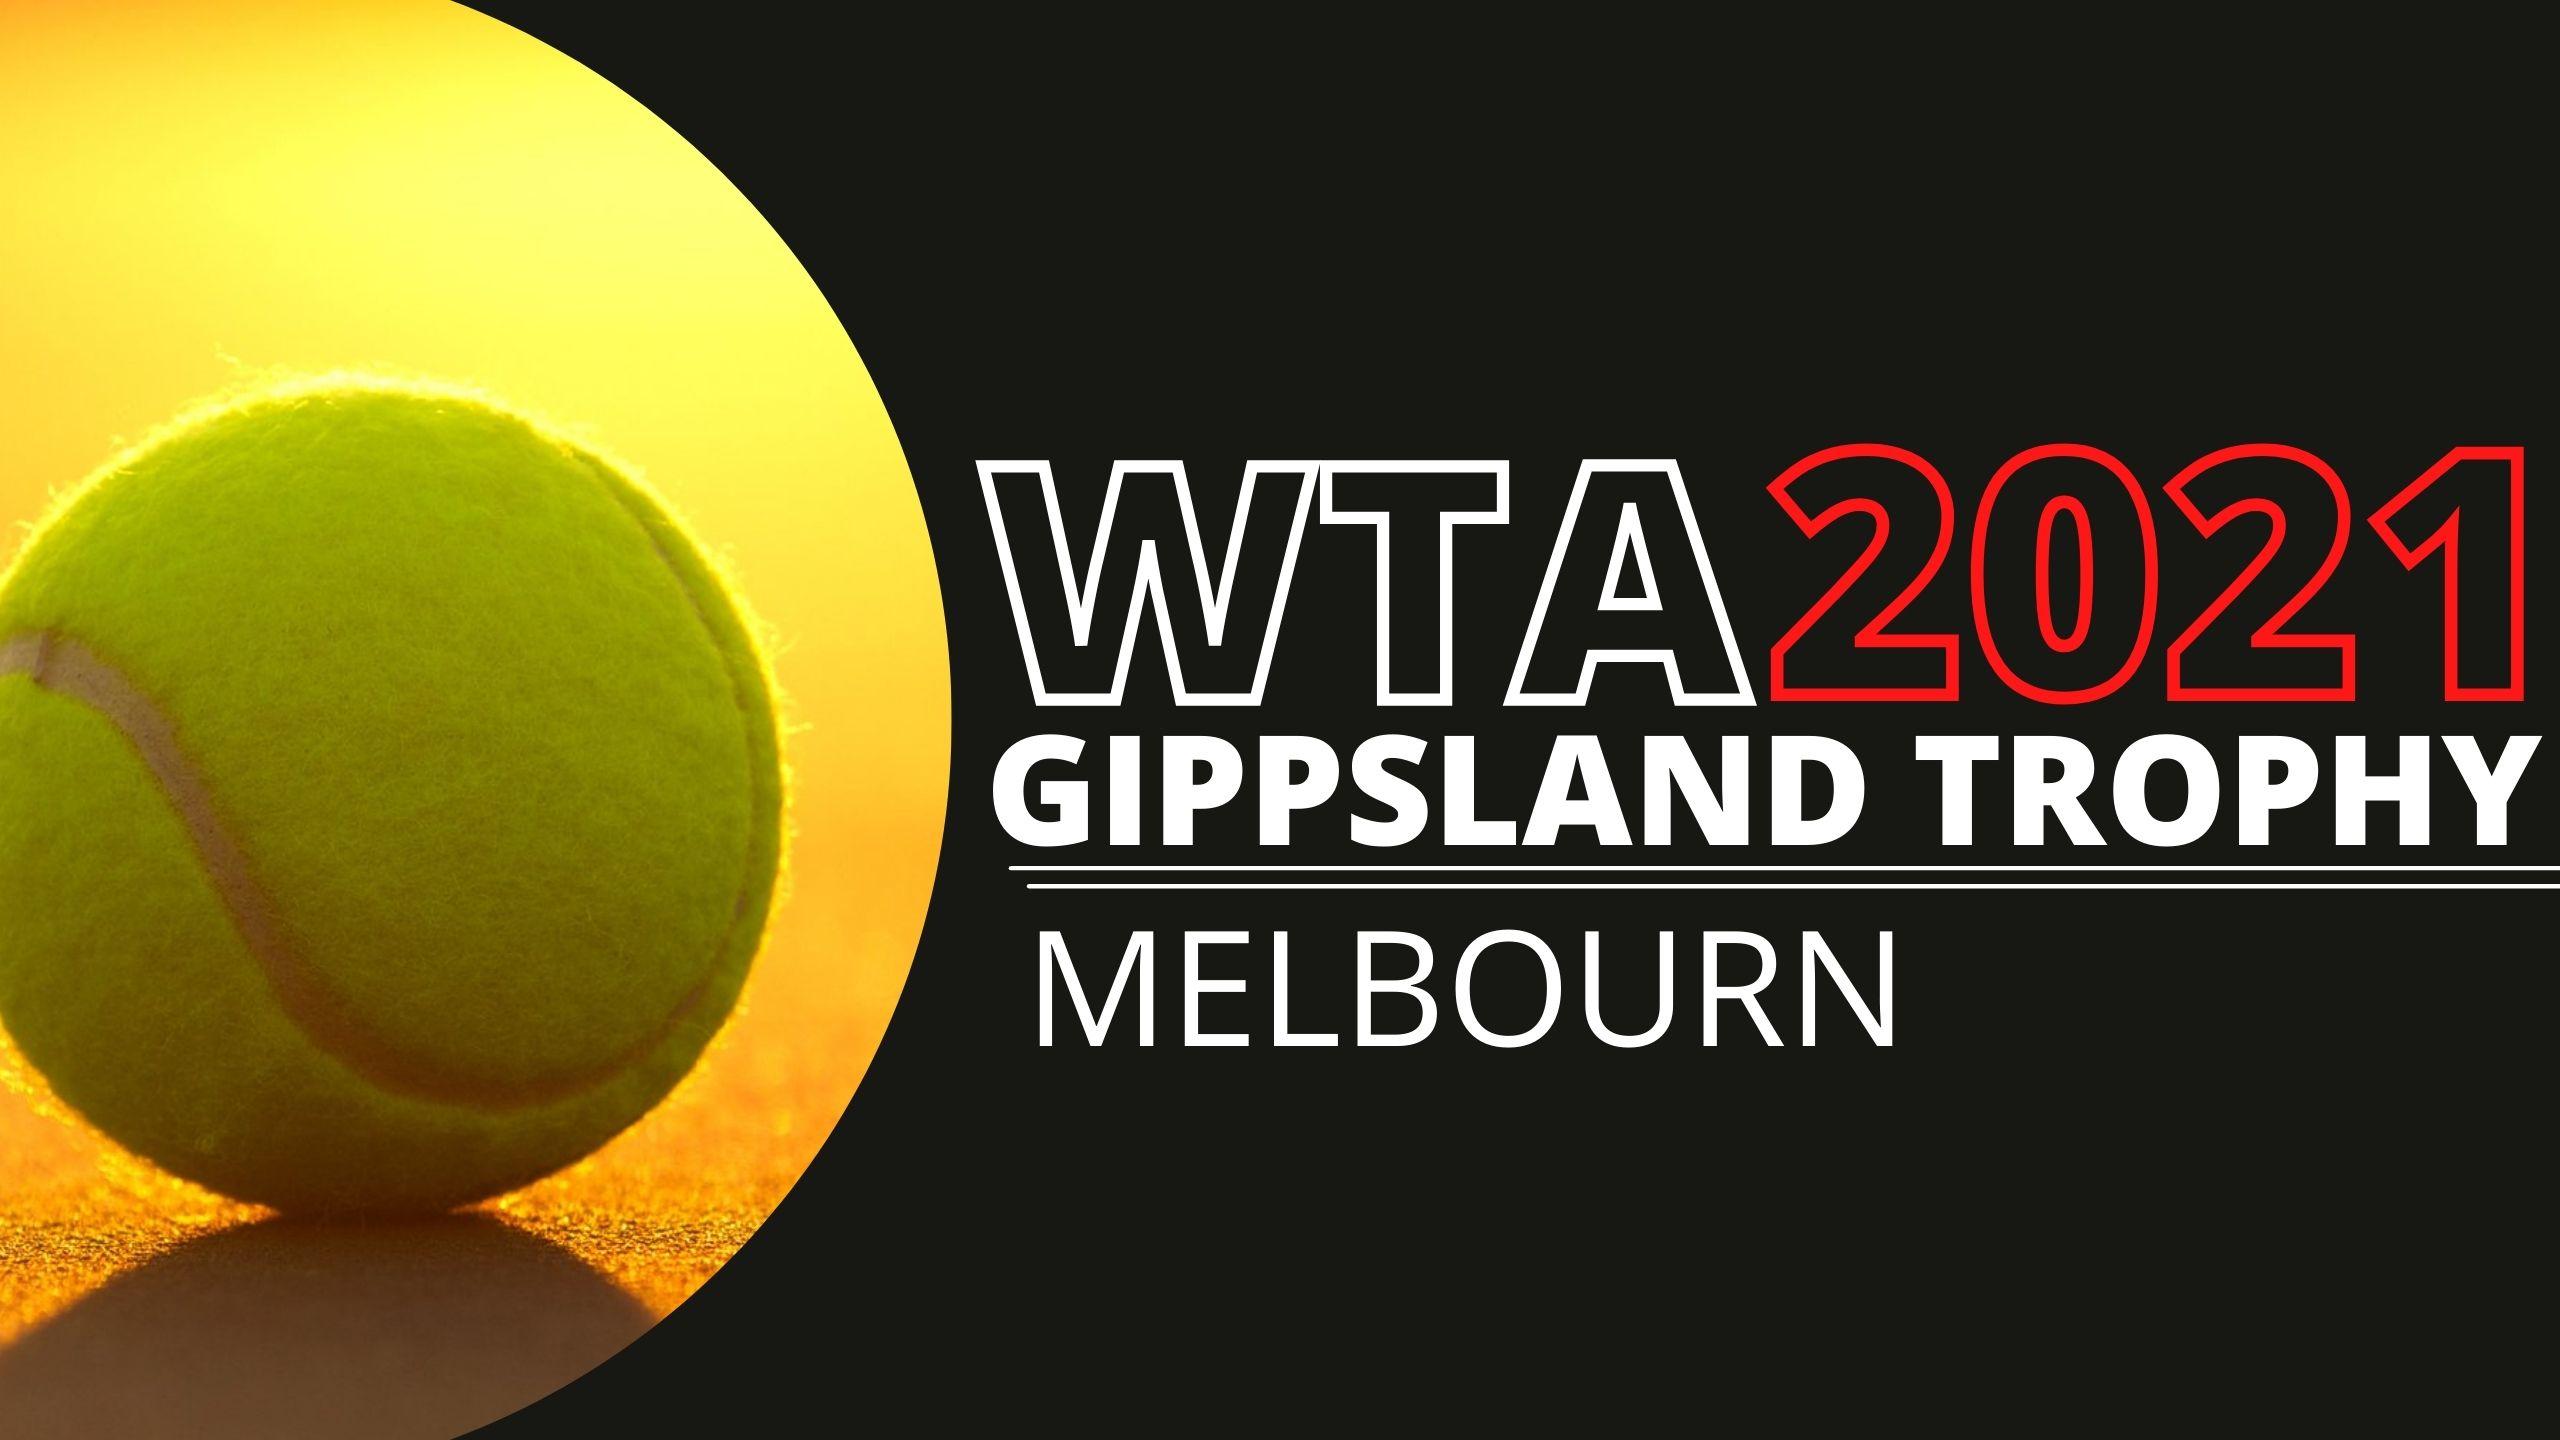 Gippsland Trophy Tennis Live Streaming 2021